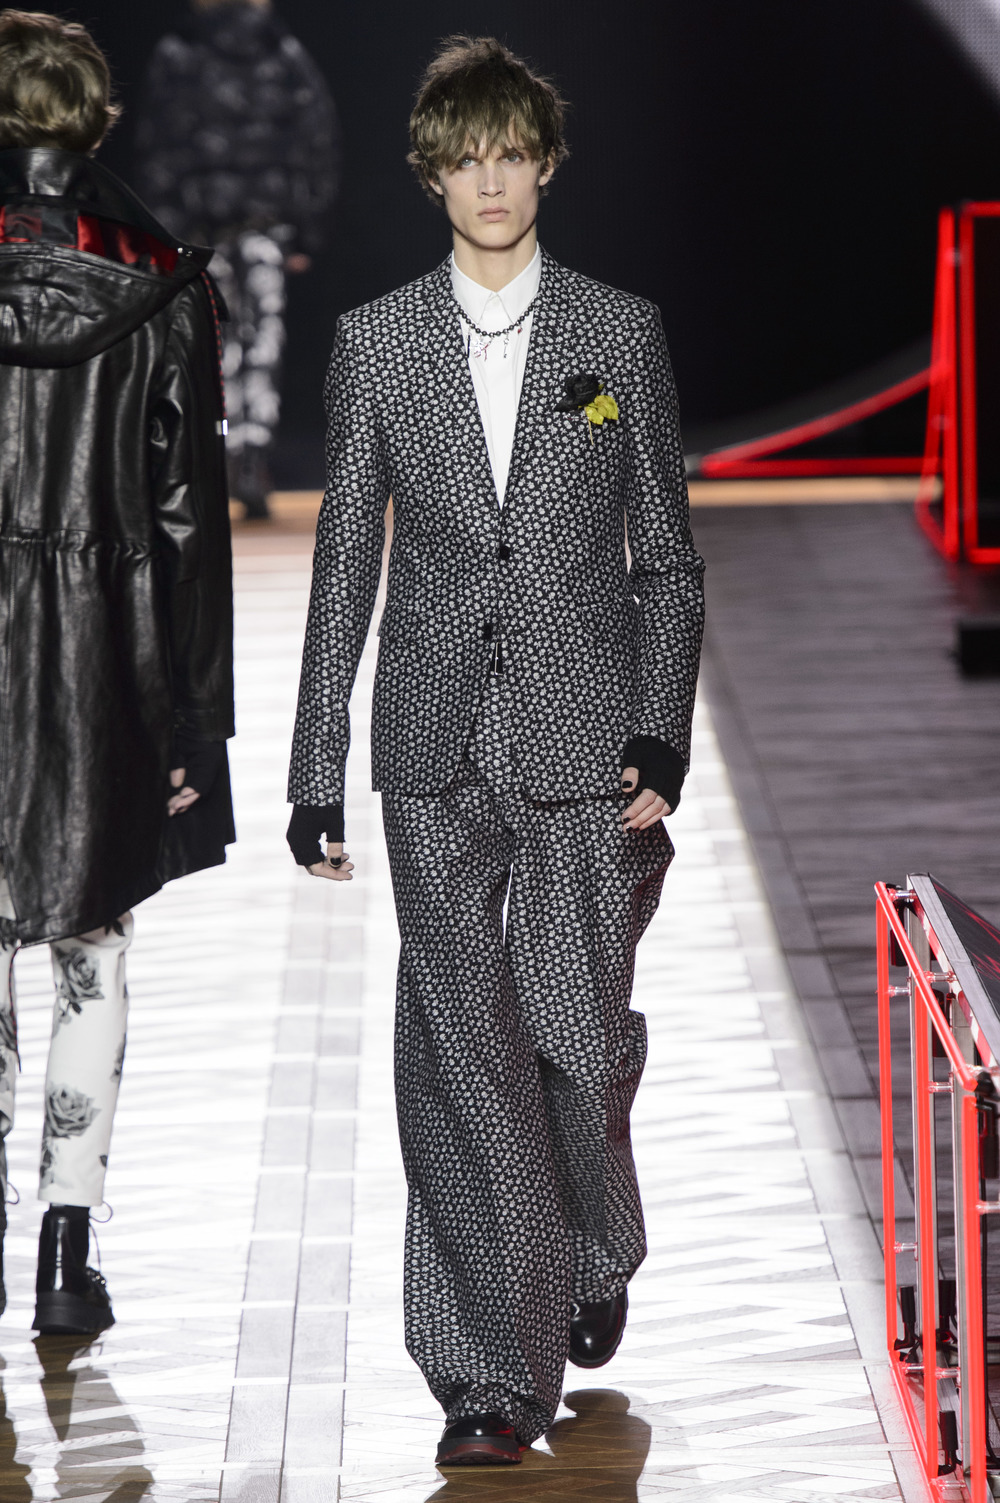 Dior_Homme_Hiver2016-17_look_49.JPG